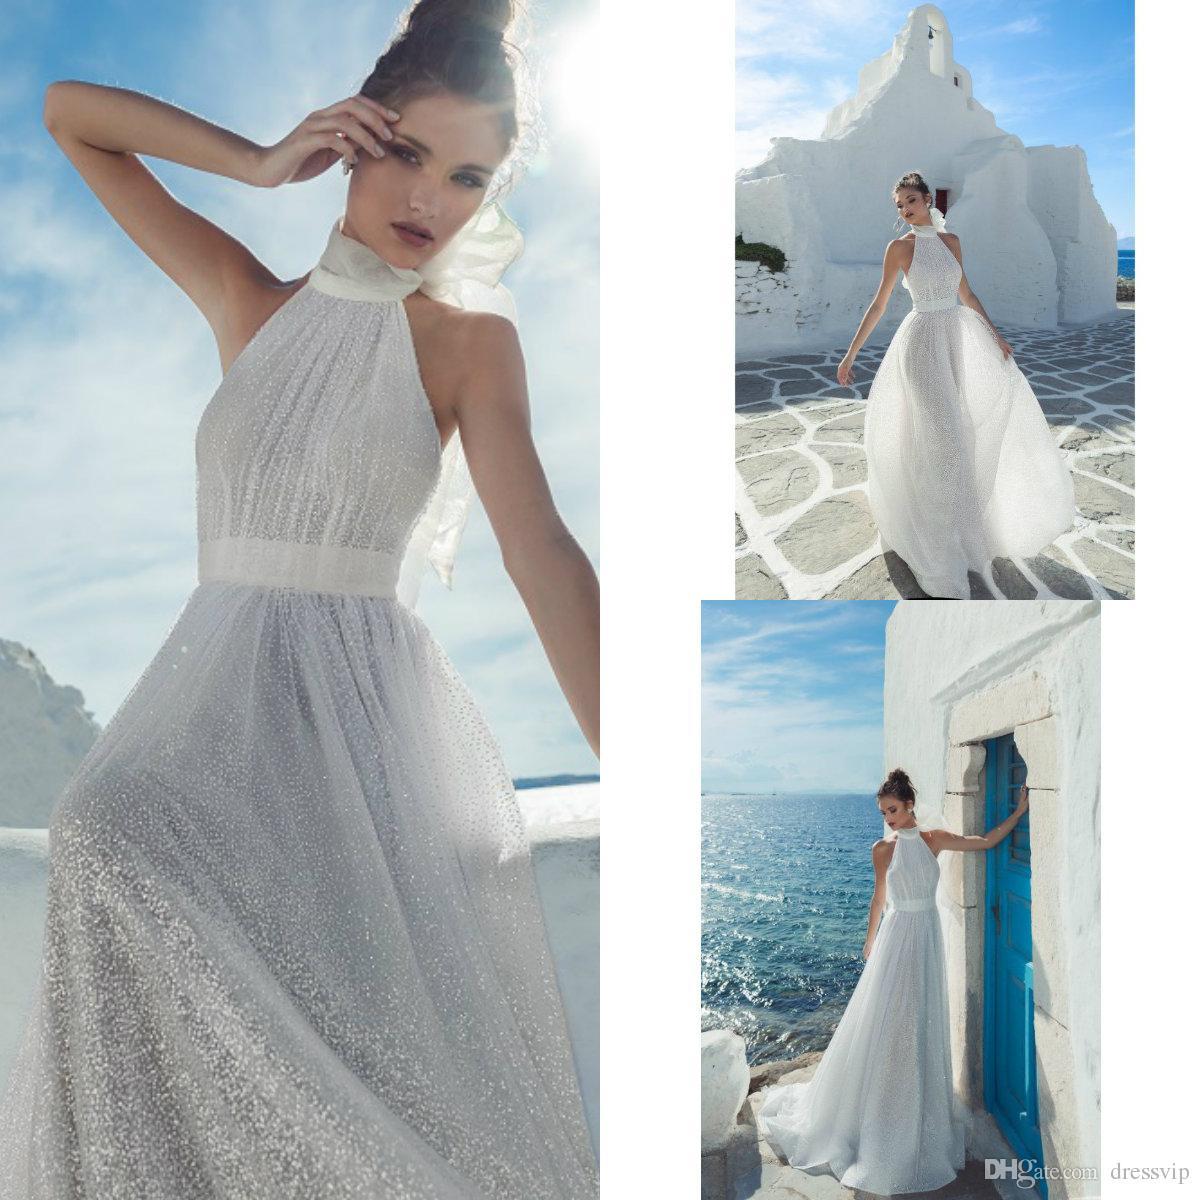 1868a5cdf5 Discount 2019 Julie Vino Beach Wedding Dresses Halter Glitter Spark A Line  Sleeveless Boho Bohemian Wedding Dress Custom Made Bridal Gowns Wedding  Dress Es ...